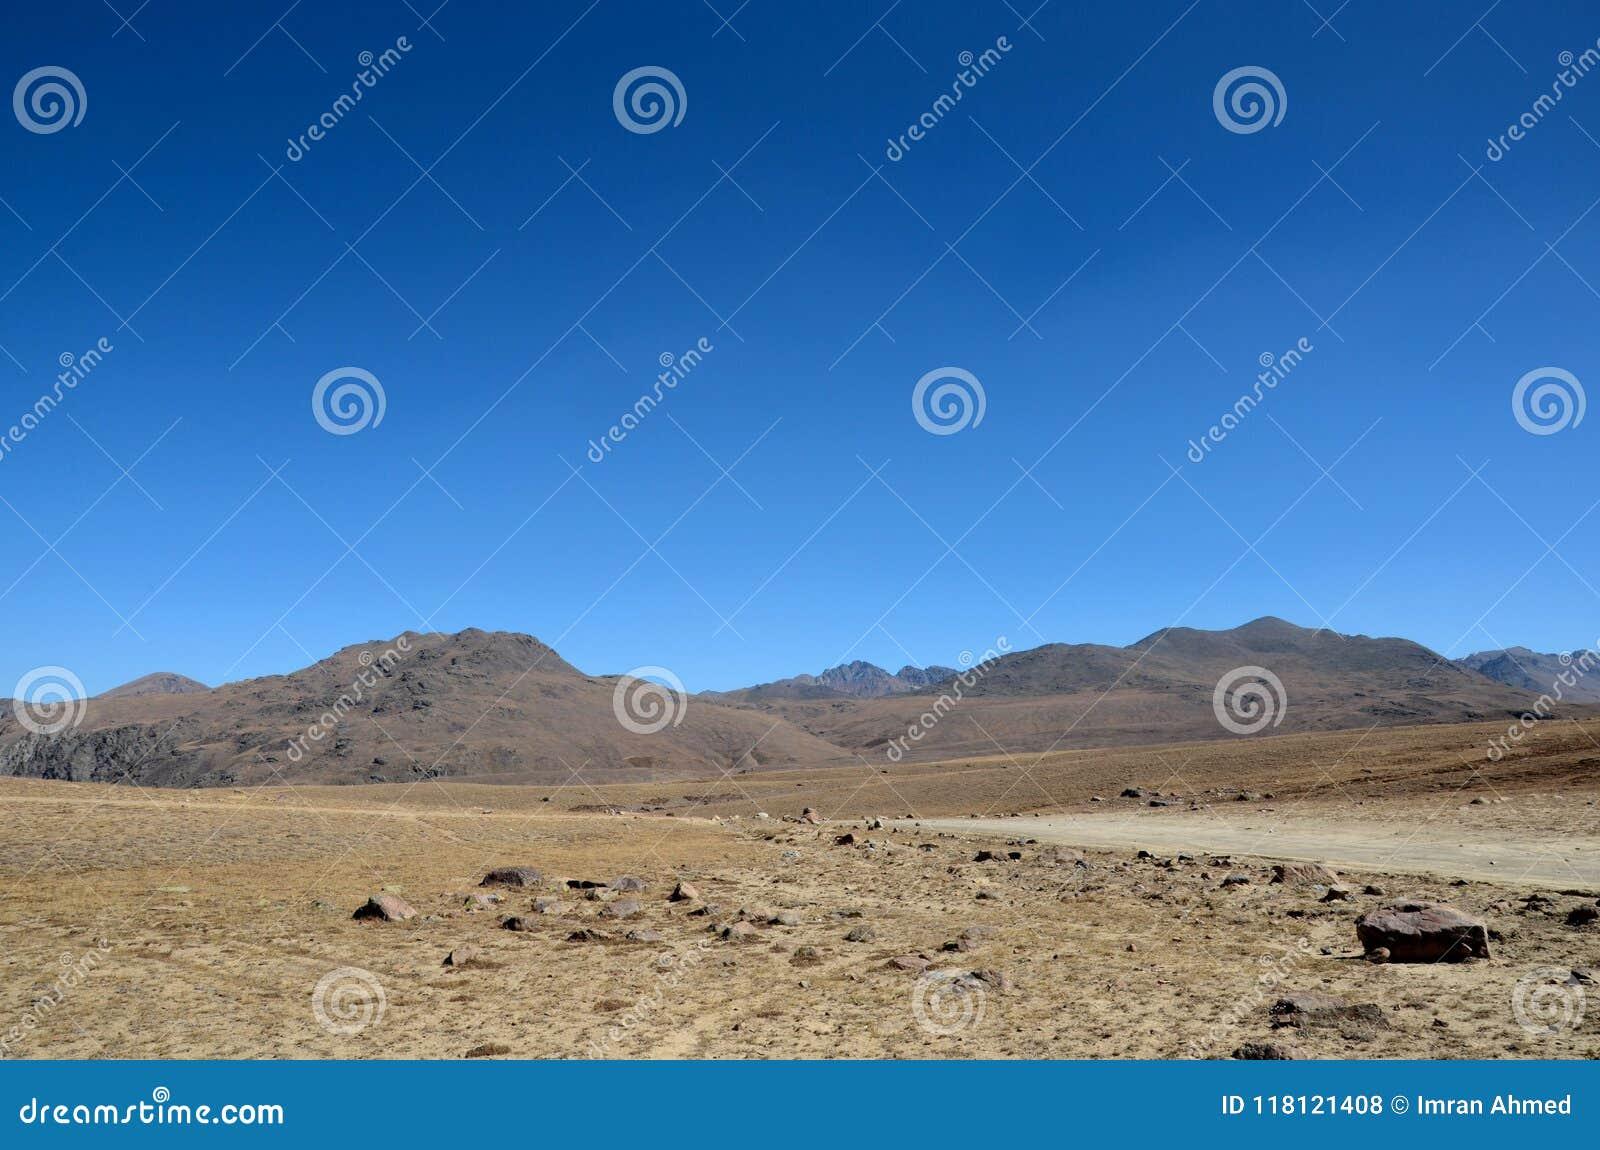 Straßen gabeln in trockenen und unfruchtbaren Deosai-Ebenen Gilgit-Baltistan Pakistan